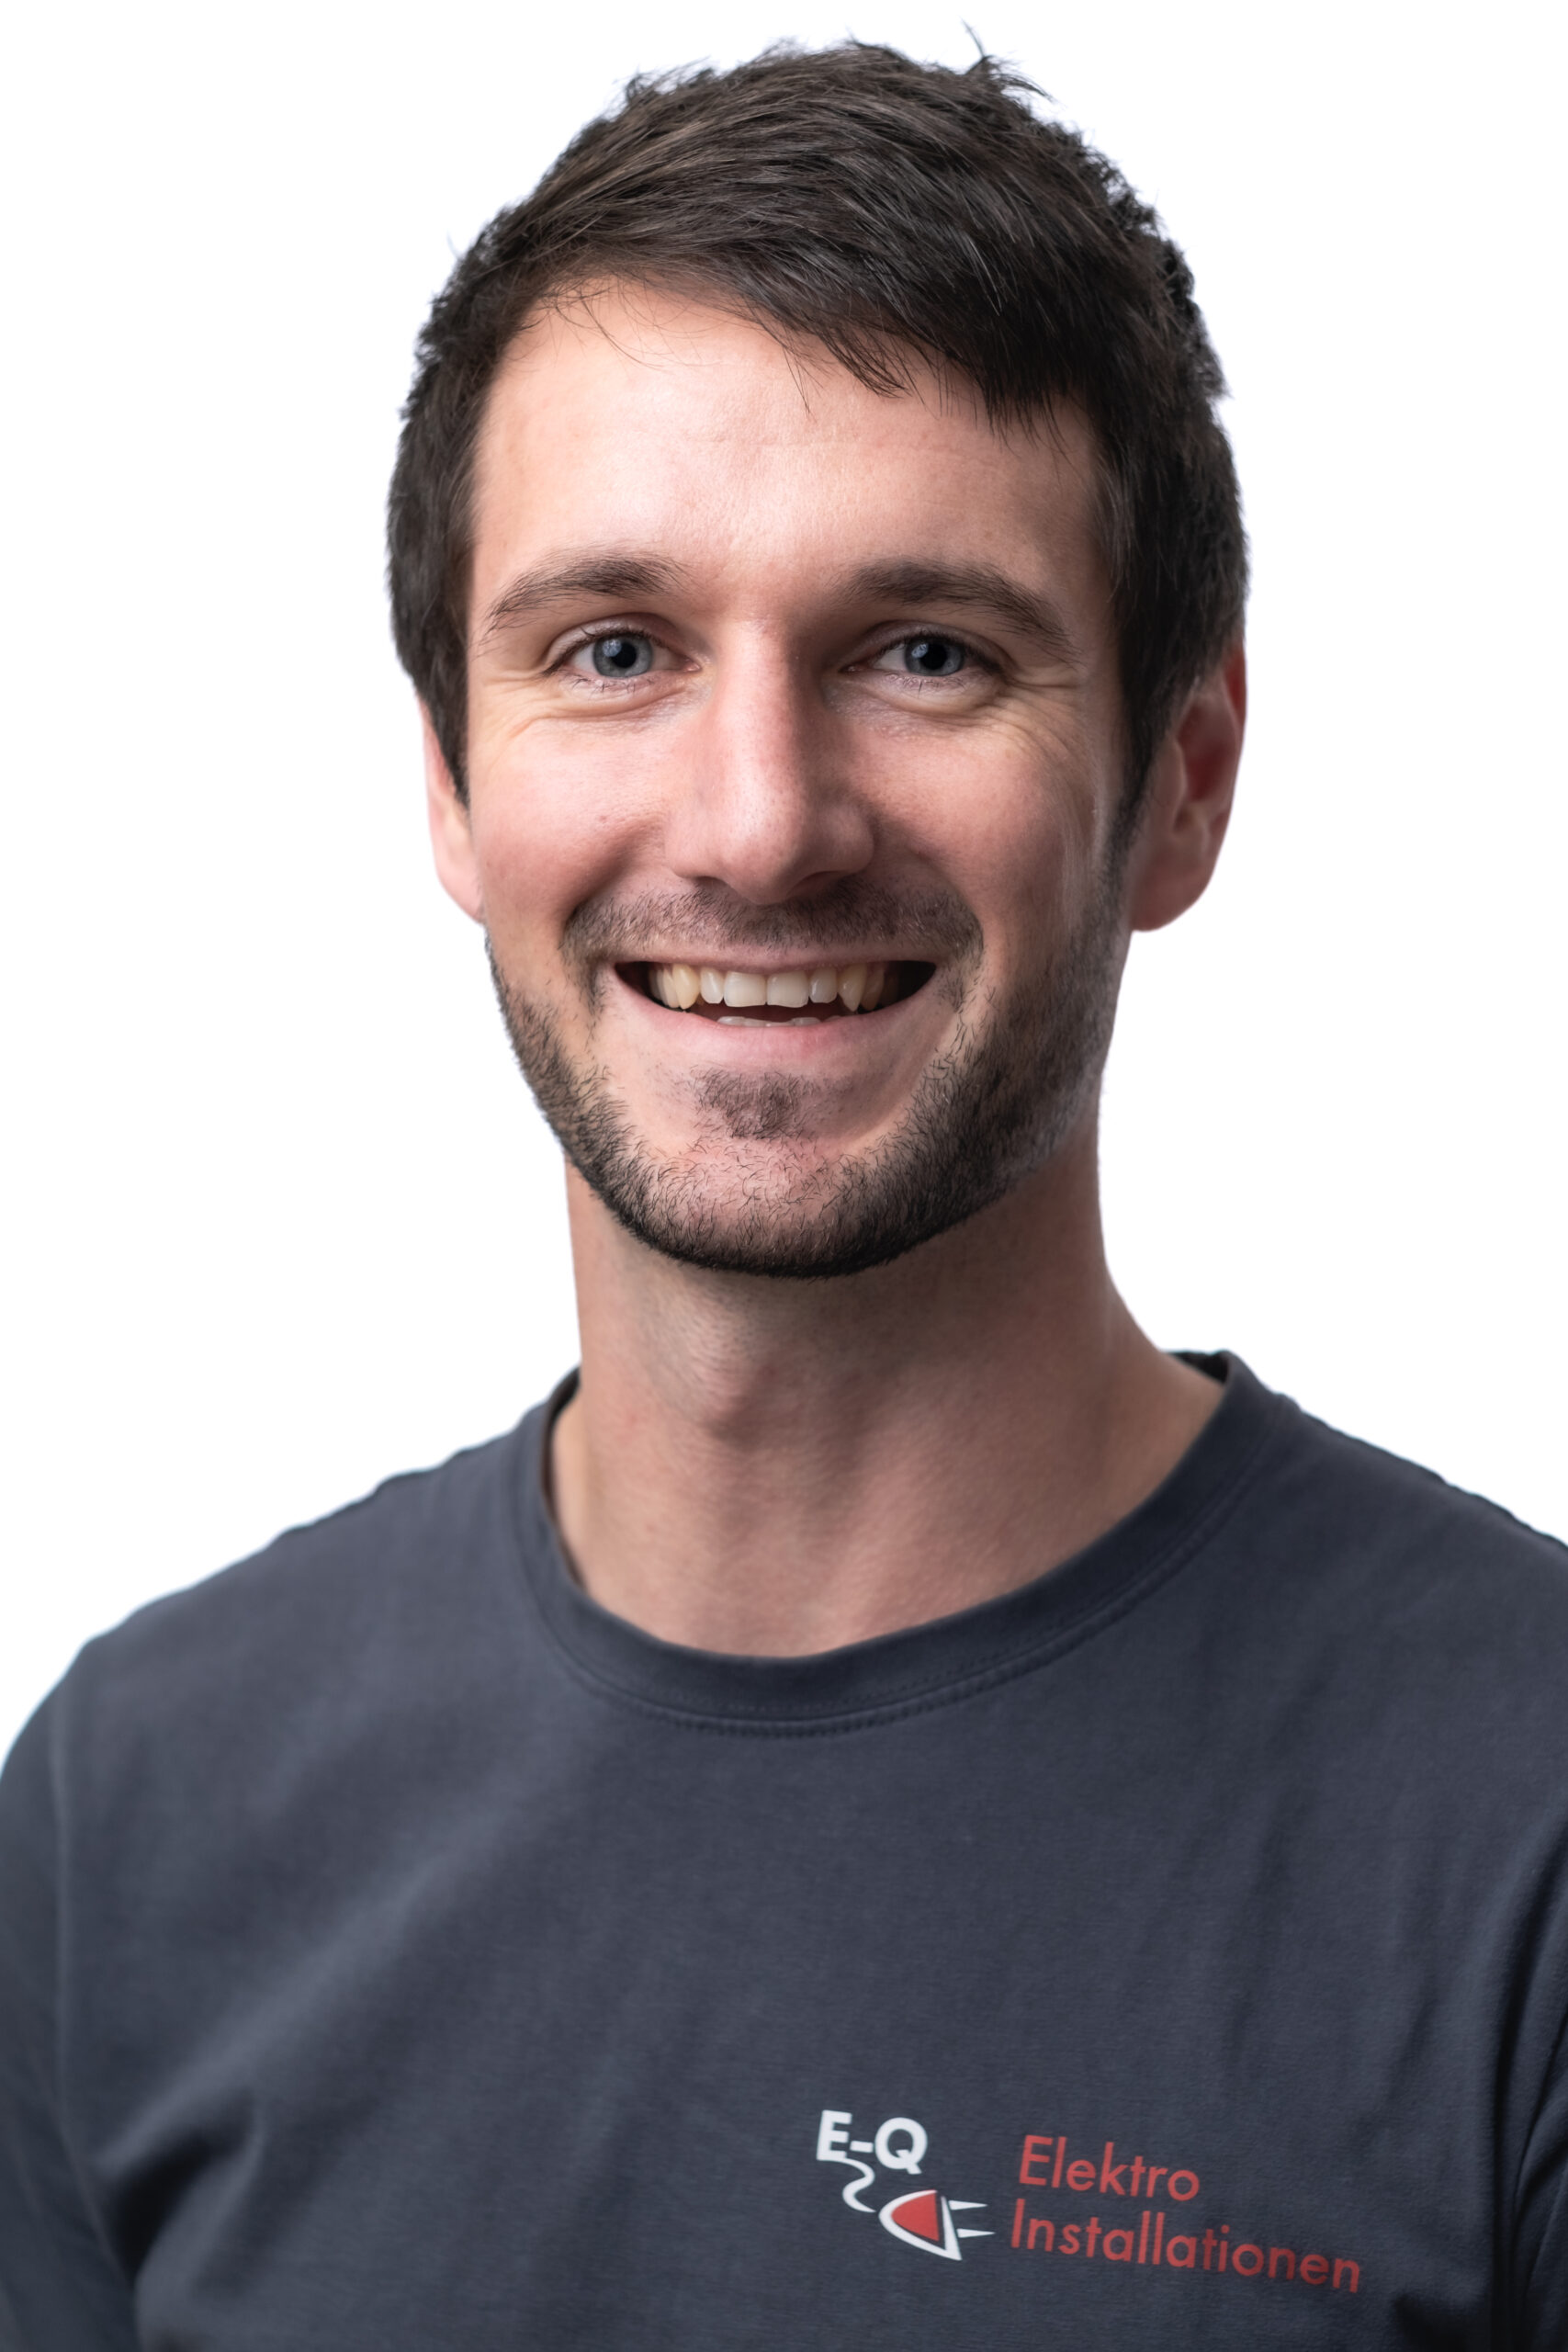 Fabian Aeberhard